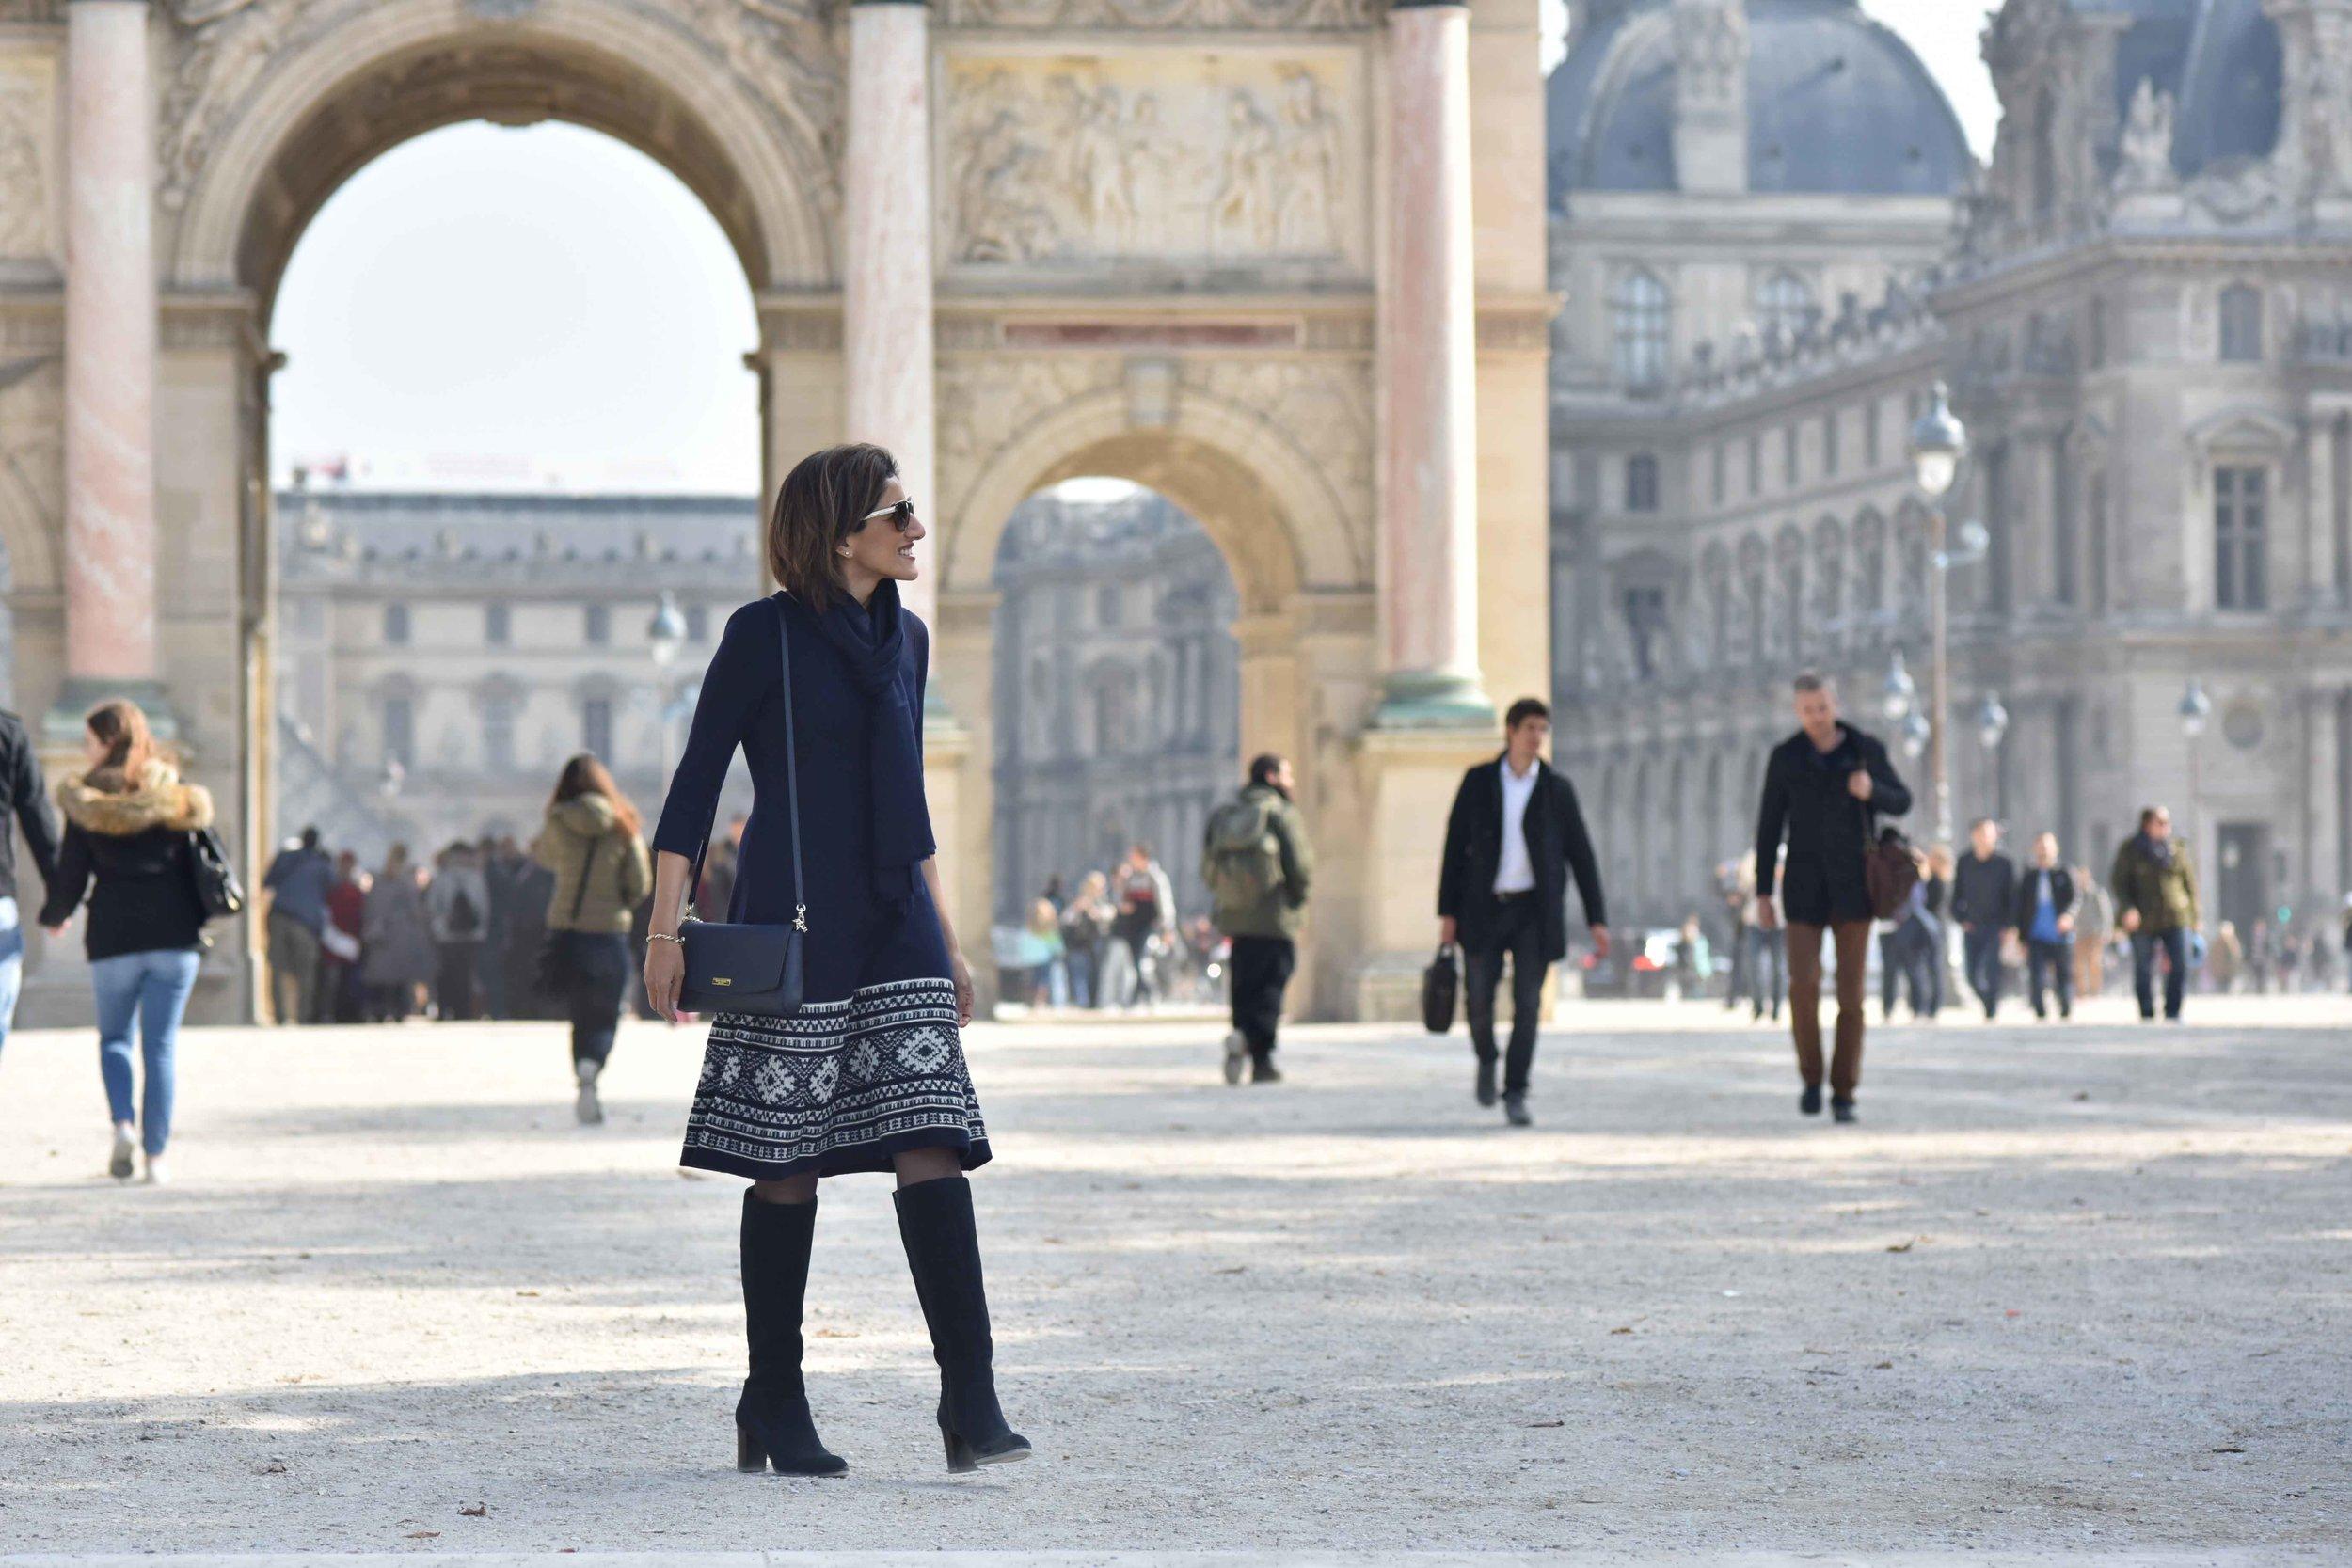 Ralph Lauren woolen jersey knit dress, Marks & Spencer knee high boots, Kate Spade sling bag, Le Louvre, Paris. Photo: Nina Shaw. Image©sourcingstyle.com